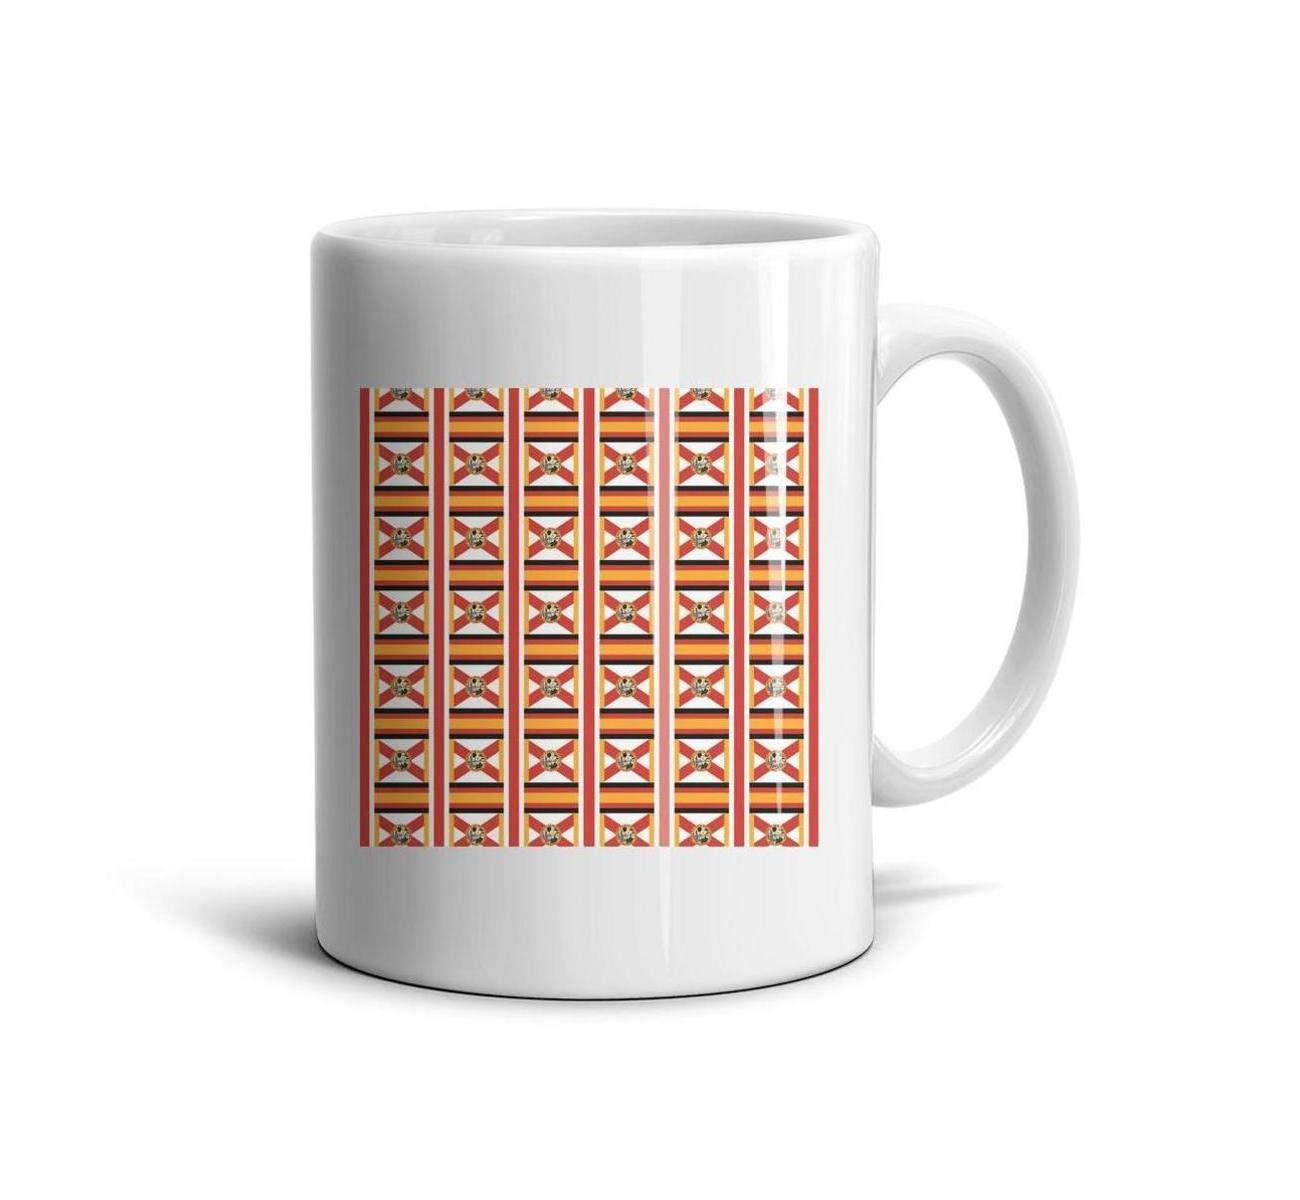 Shirtjkdsaa Funny Coffee Mug Florida State Flag Miami Fashion White Ceramic Souvenir Reusable Tea Mugs